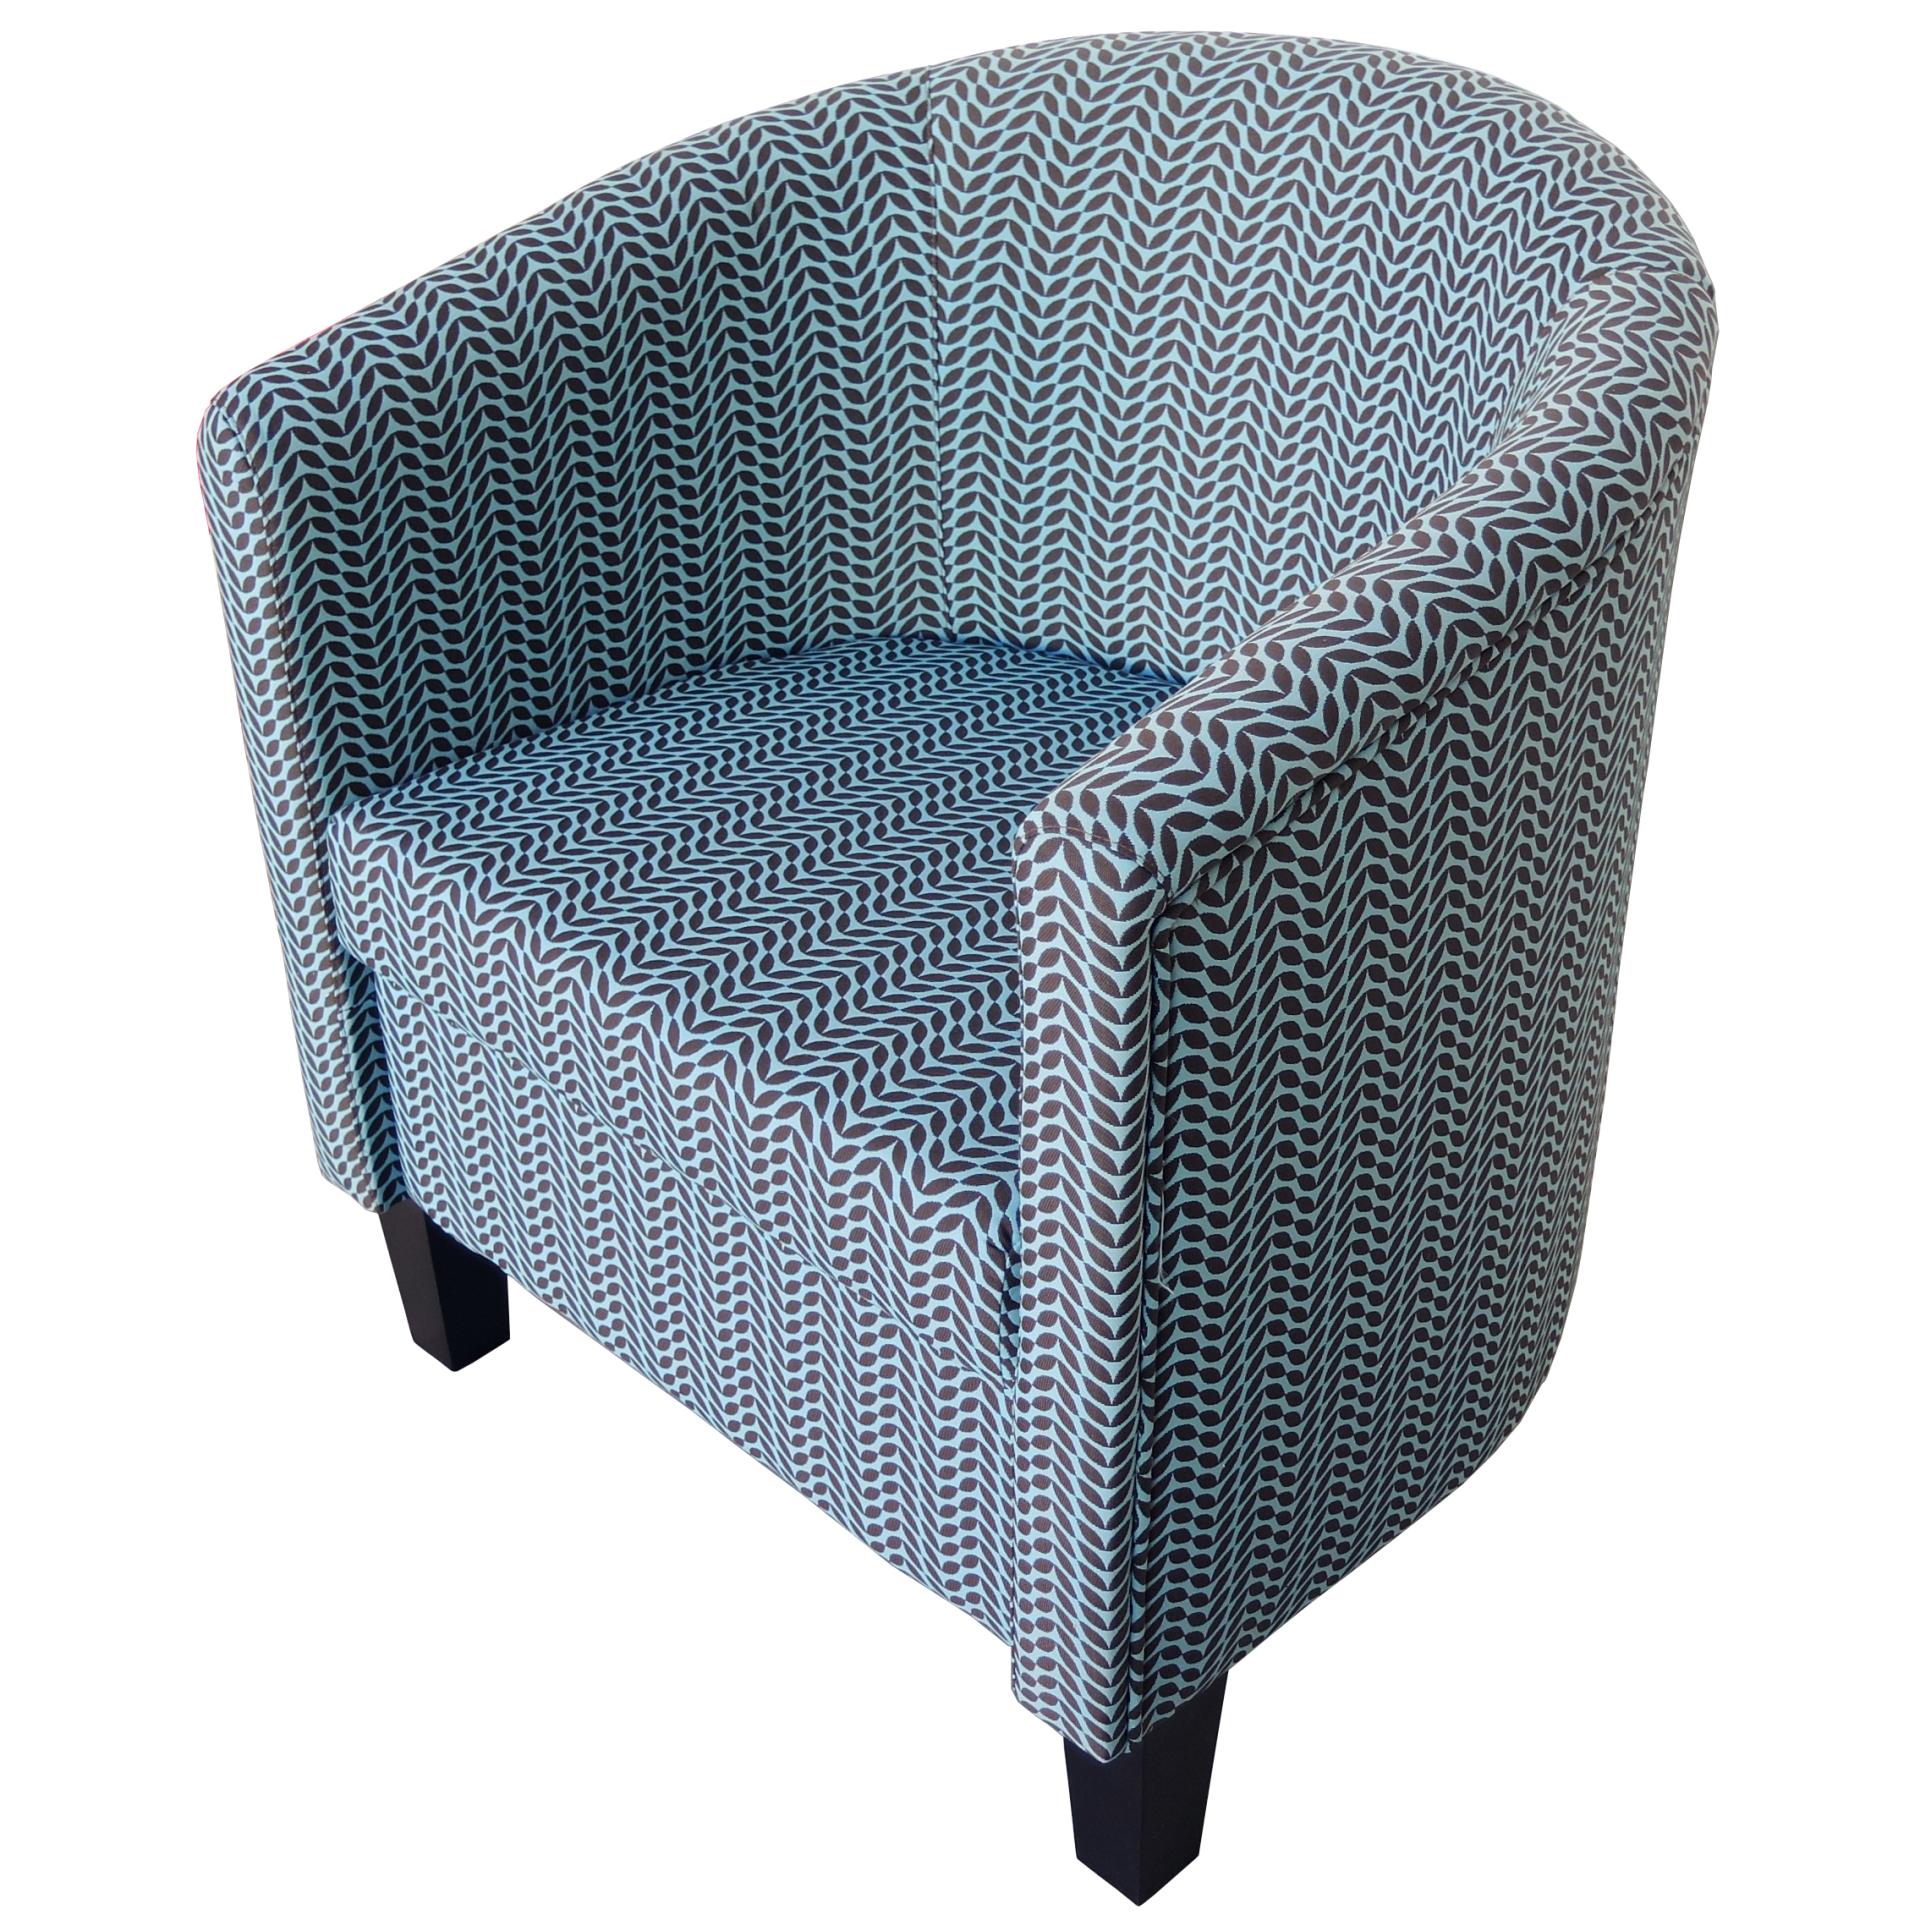 Direct Ergonomics | Sydney Office Furniture | Ergonomic Furniture | Collaborative Seating | Waiting Lounges | Waiting Room Seating | Ergonomic Seating | RD Tub